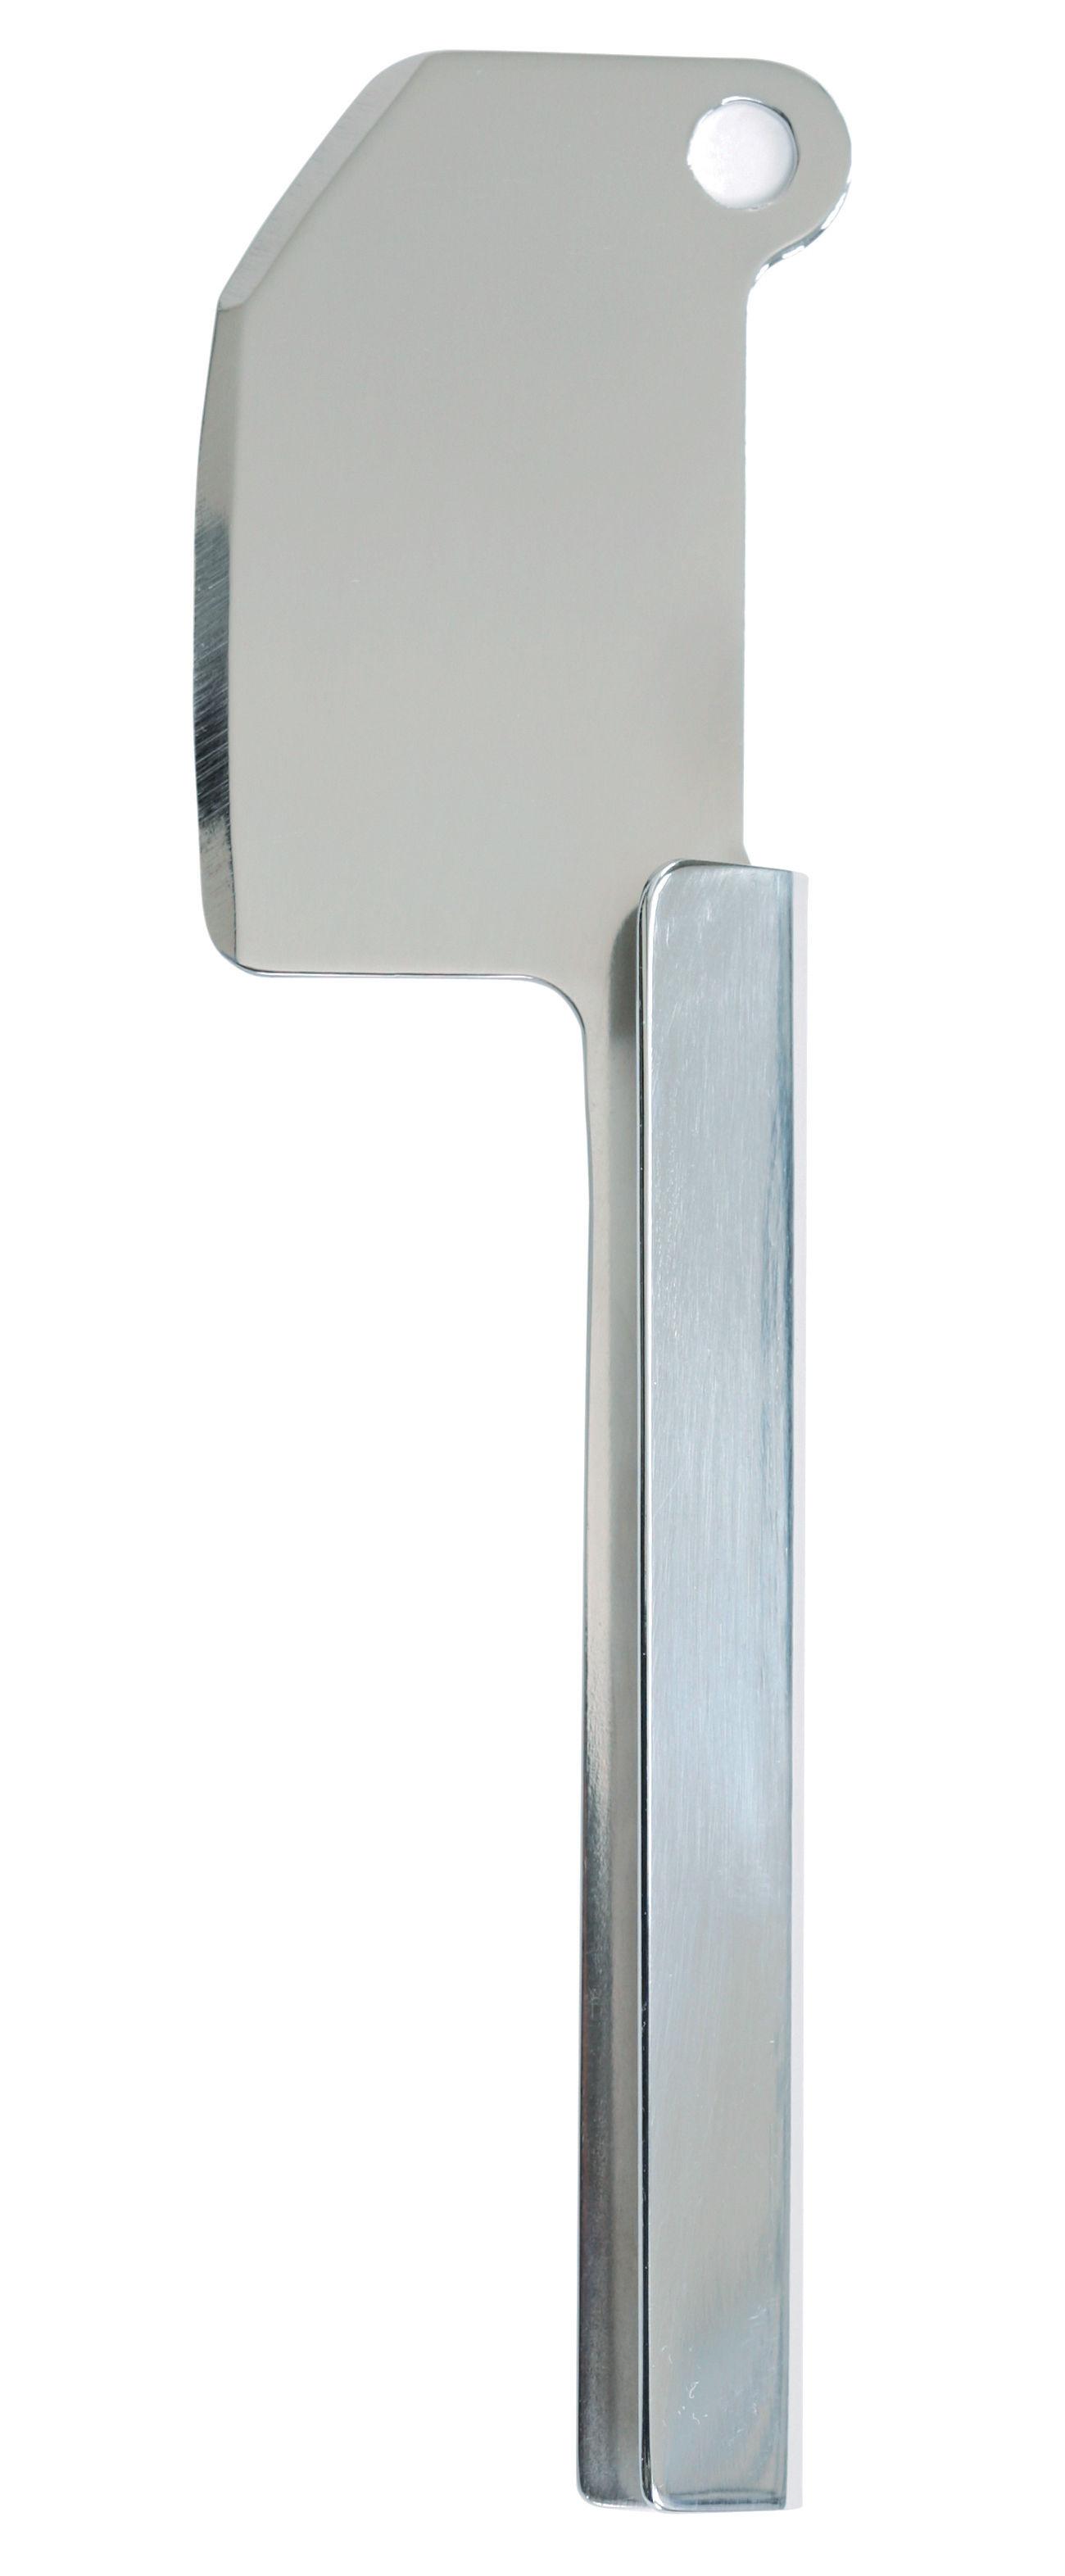 Küche - Küchenmesser - Plié Käsemesser - ENOstudio - Edelstahl - polierter Edelstahl